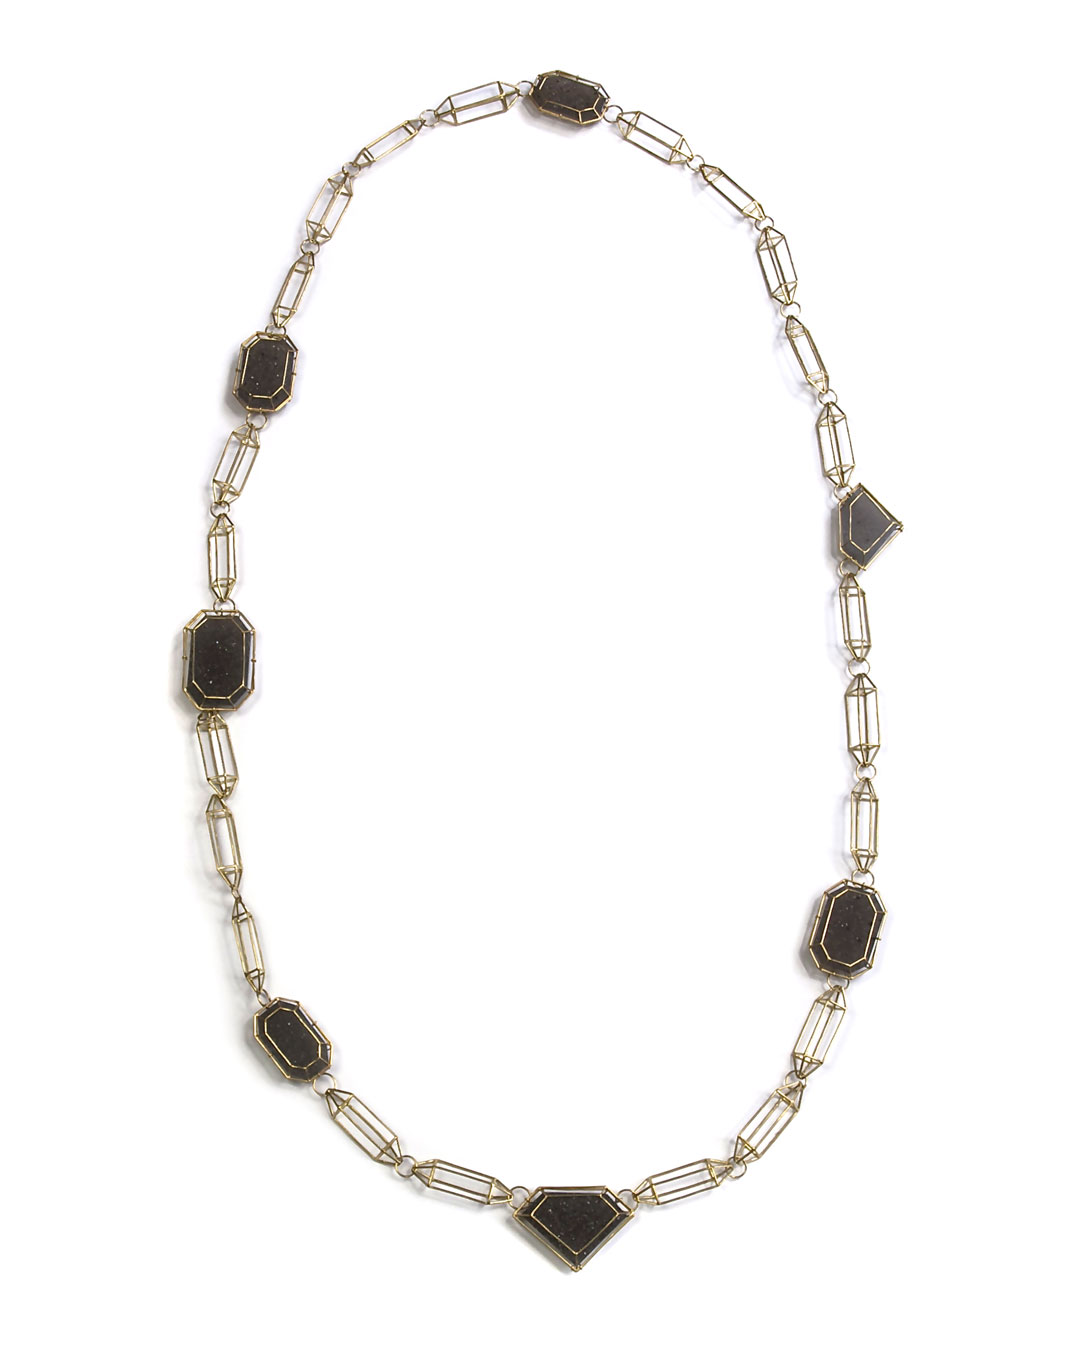 Etsuko Sonobe, untitled, 2006, necklace; 18ct gold, agate, 425 x 200 x 7 mm, €7000